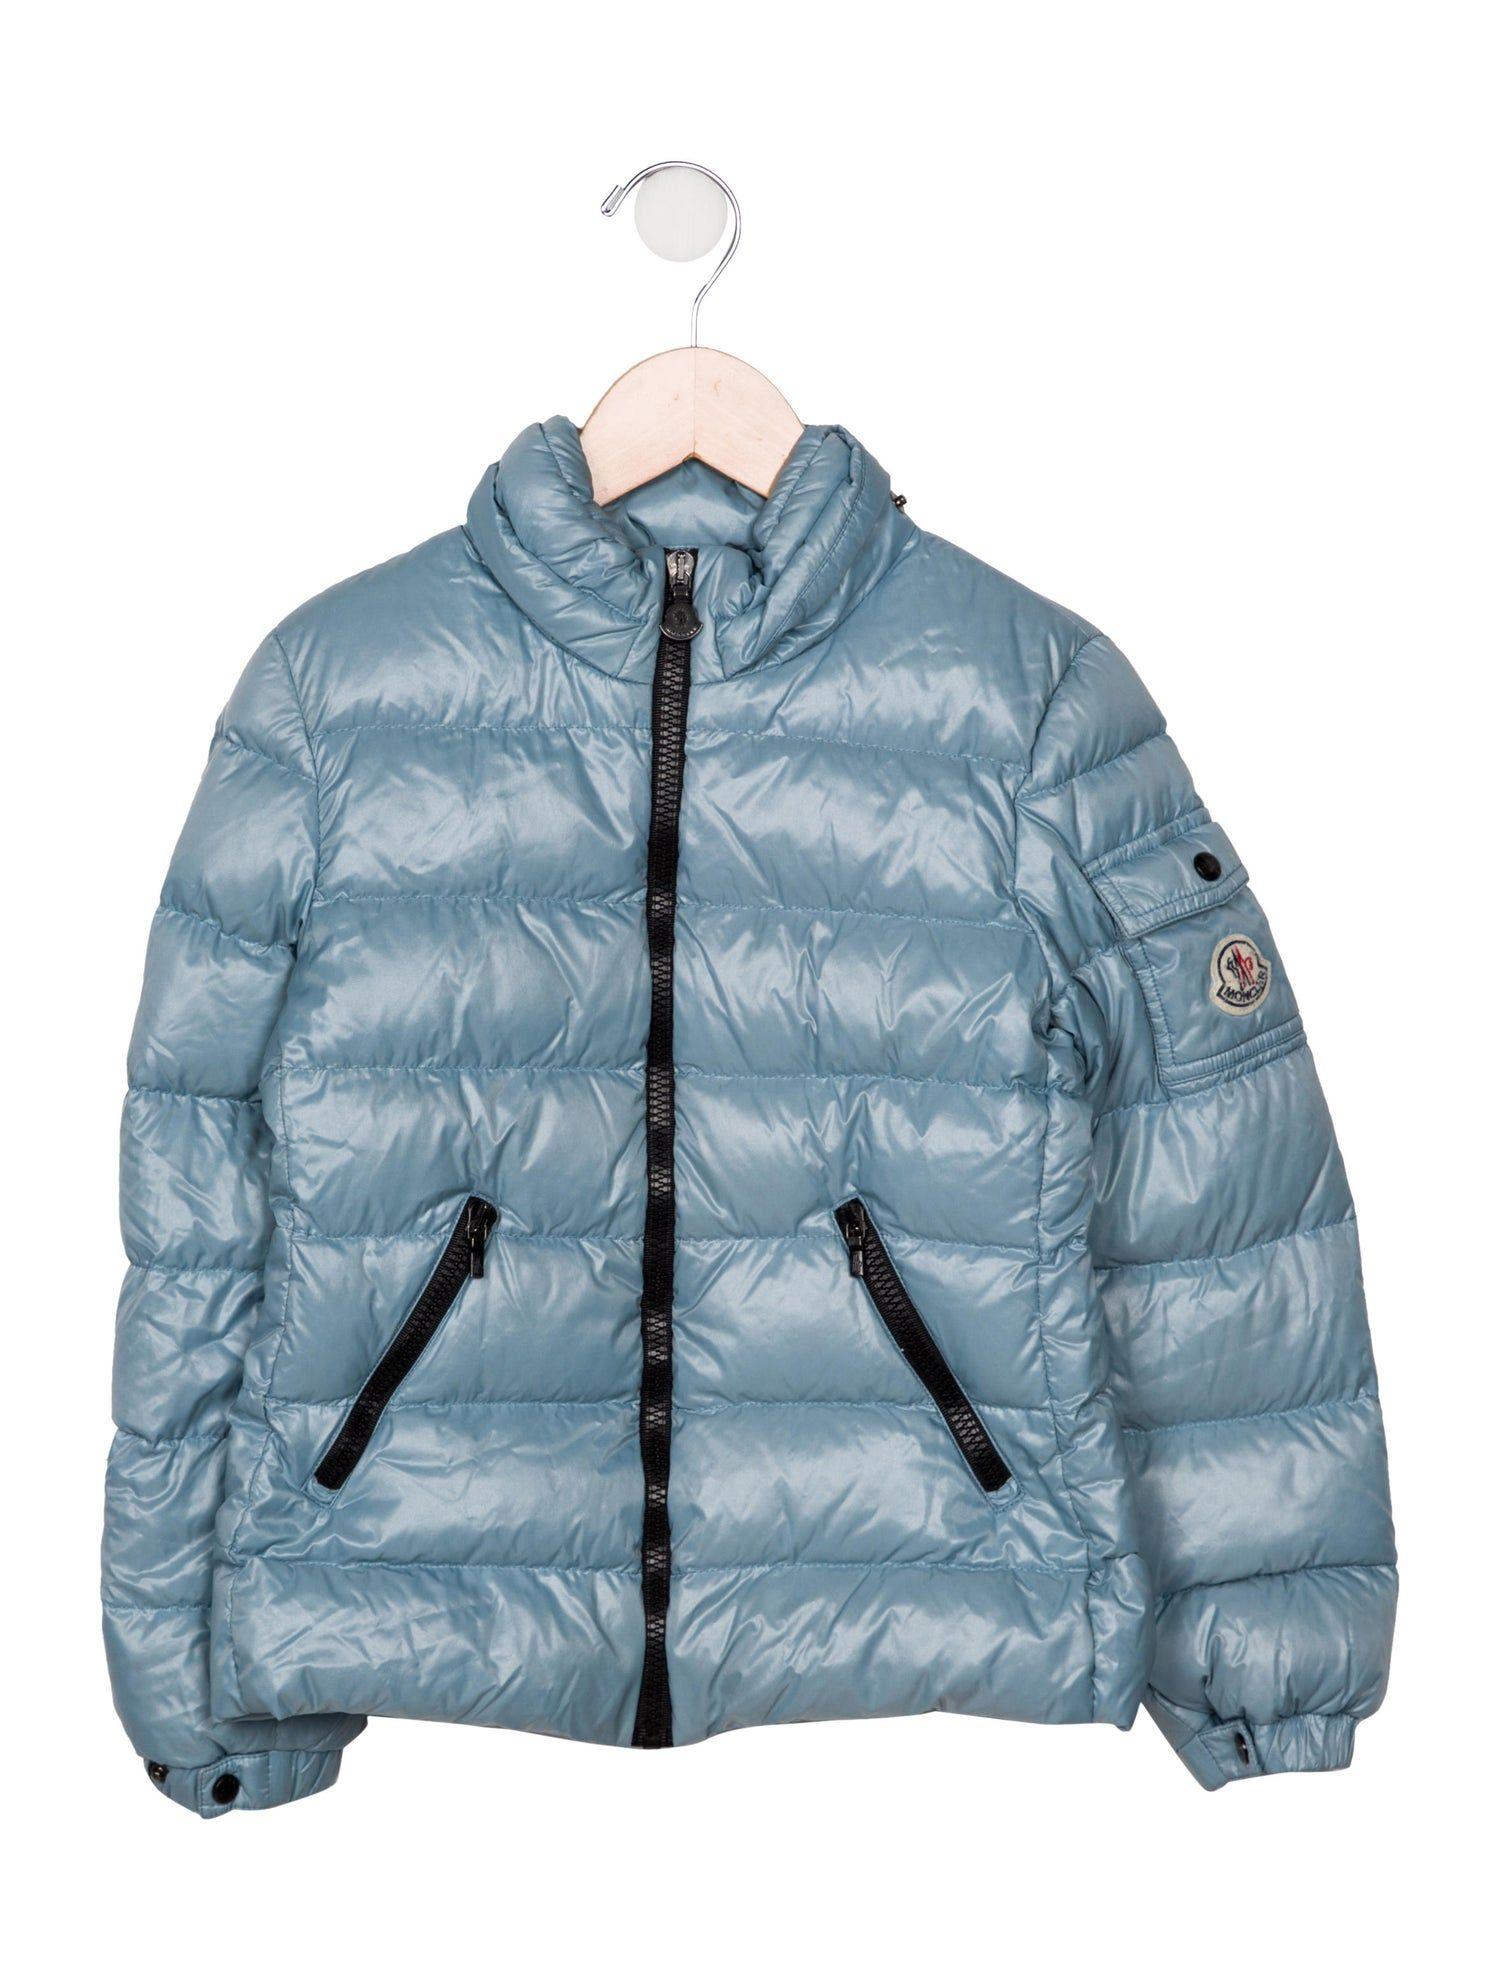 Moncler Girls' Bady Down Jacket SPONSORED Girls Moncler